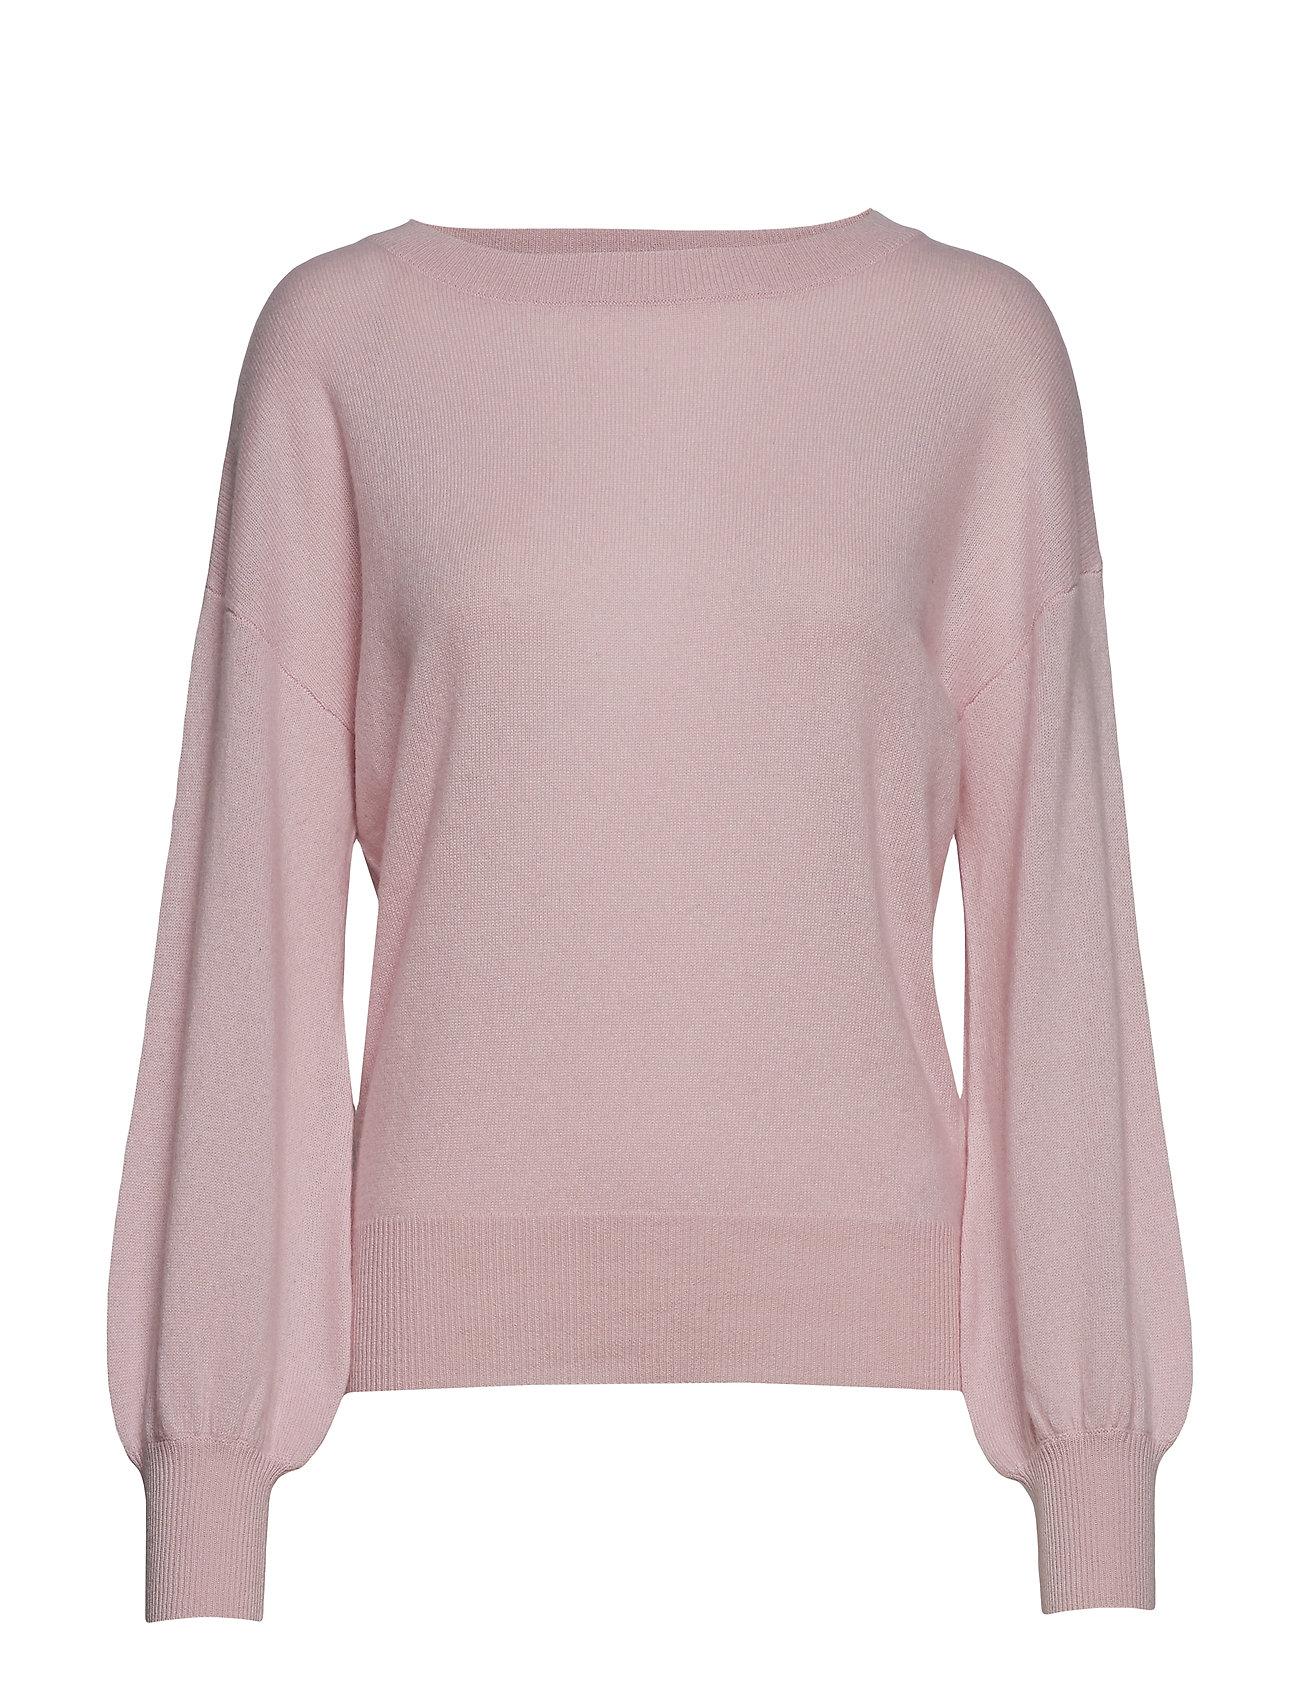 Davida Cashmere Balloon Sleeve Sweater - LIGHT PINK